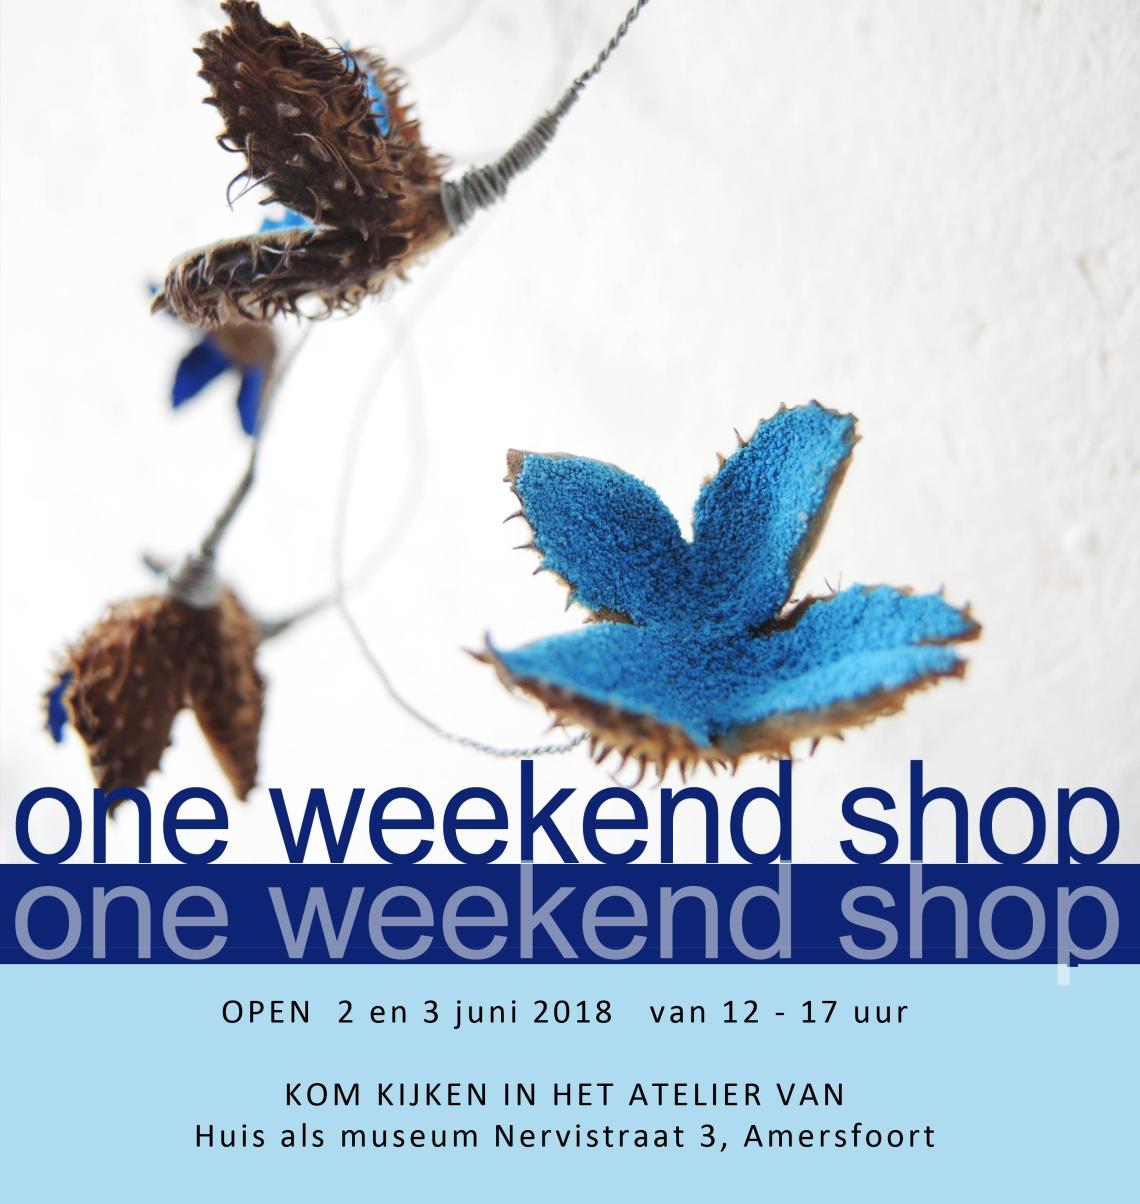 affiche One weekend shop2018 eerste zfb